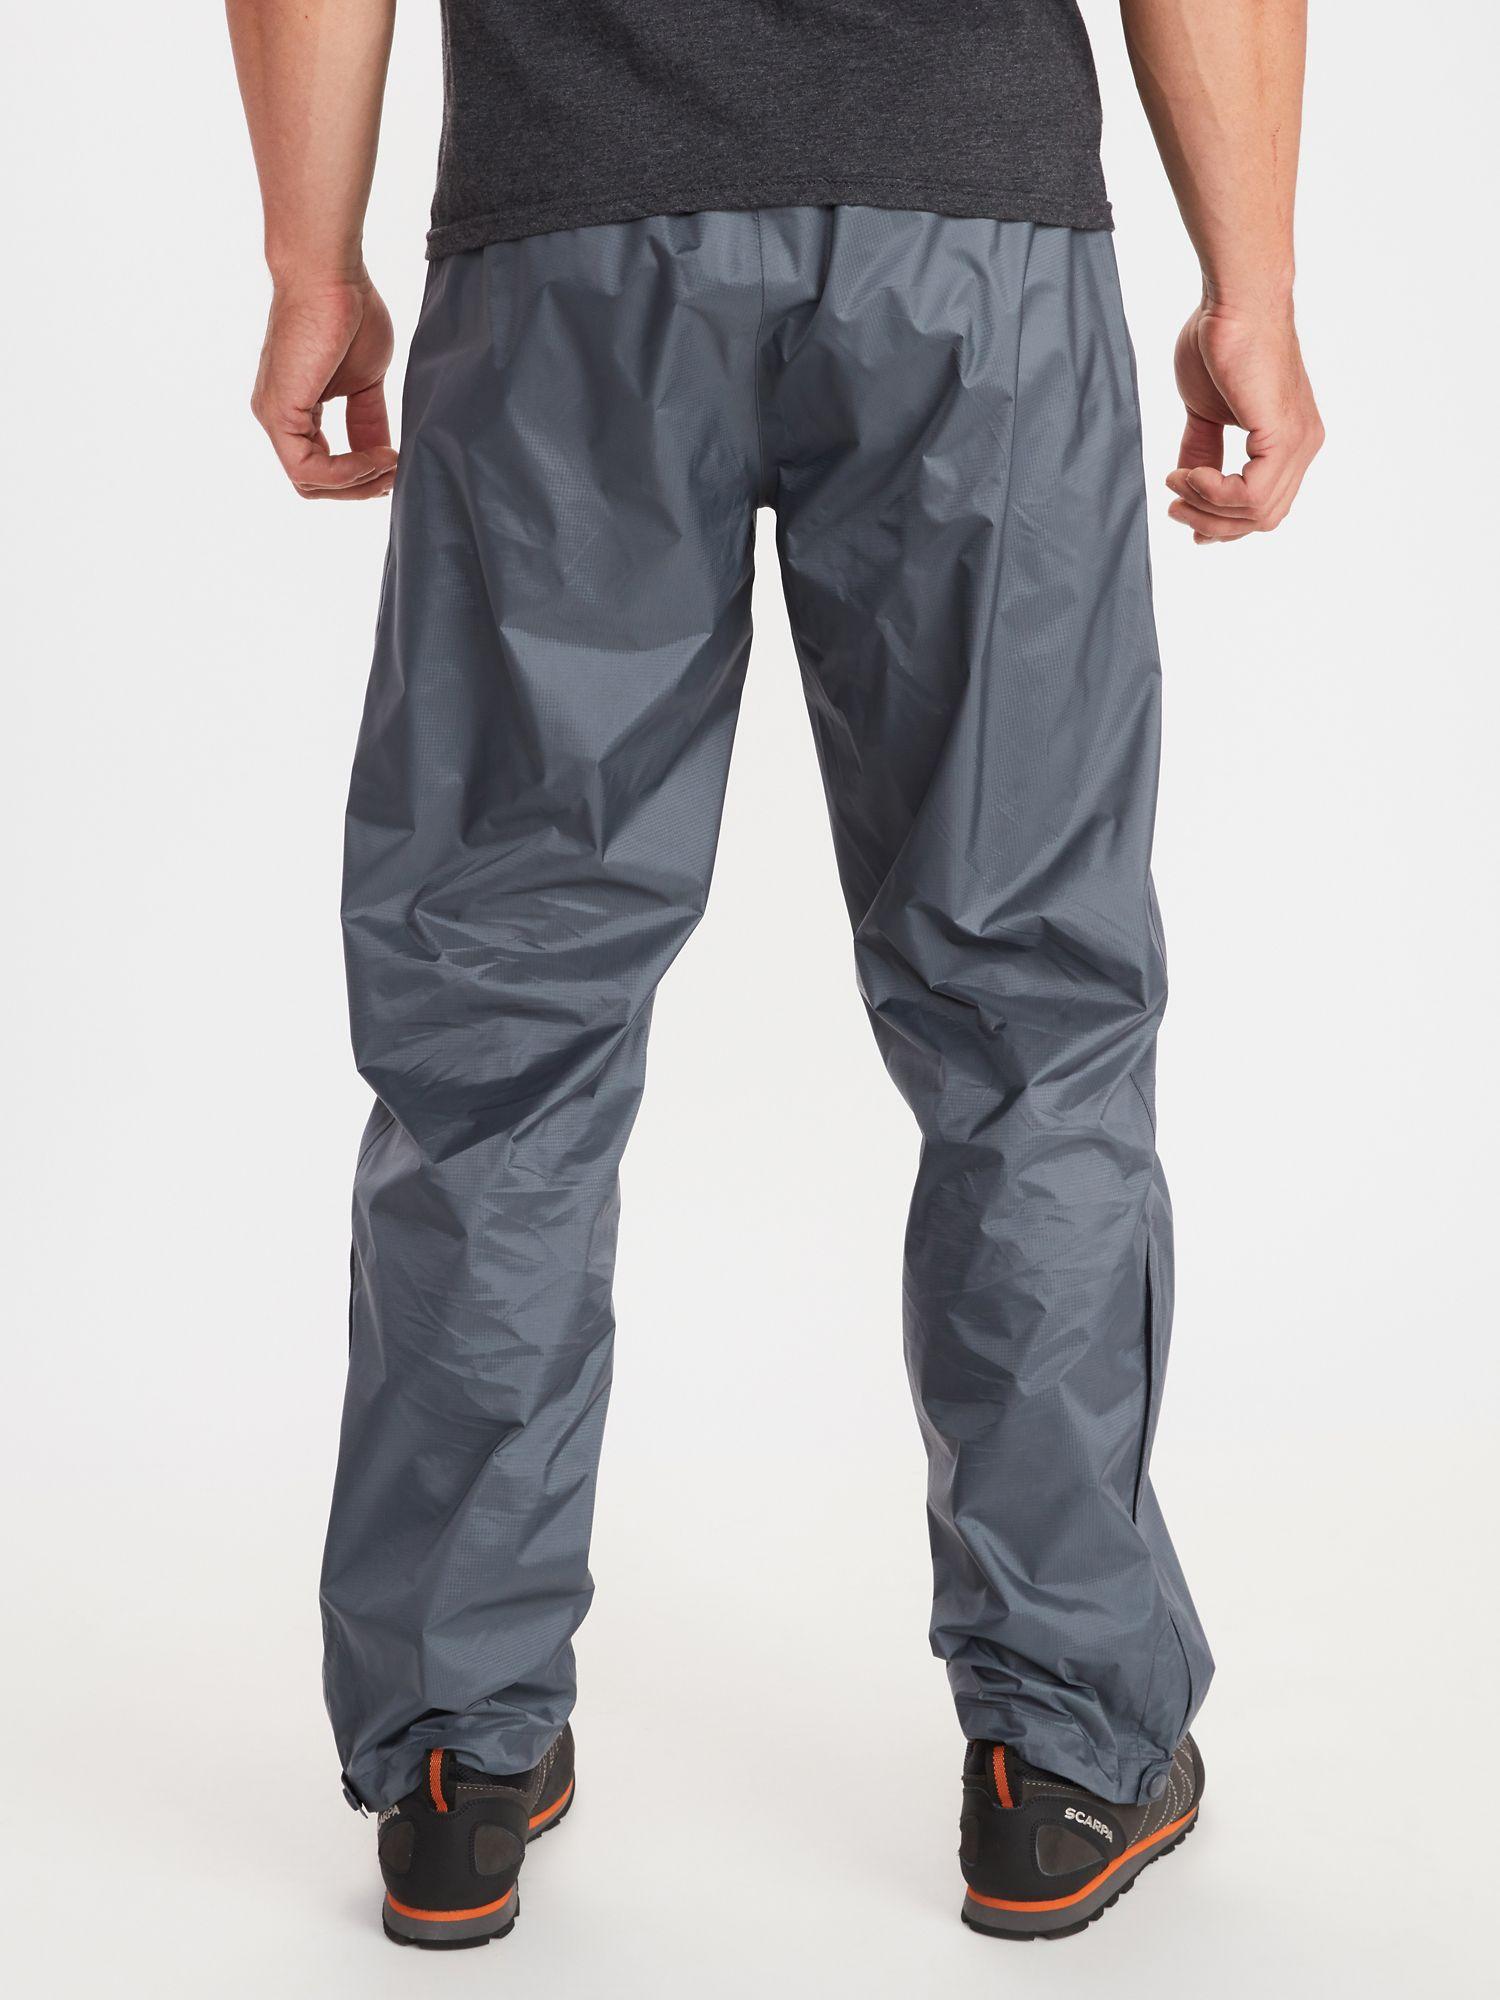 Marmot Mens Precip Eco Pant Short Hardshell Rain Proof Pants Waterproof Trousers Breathable Windproof